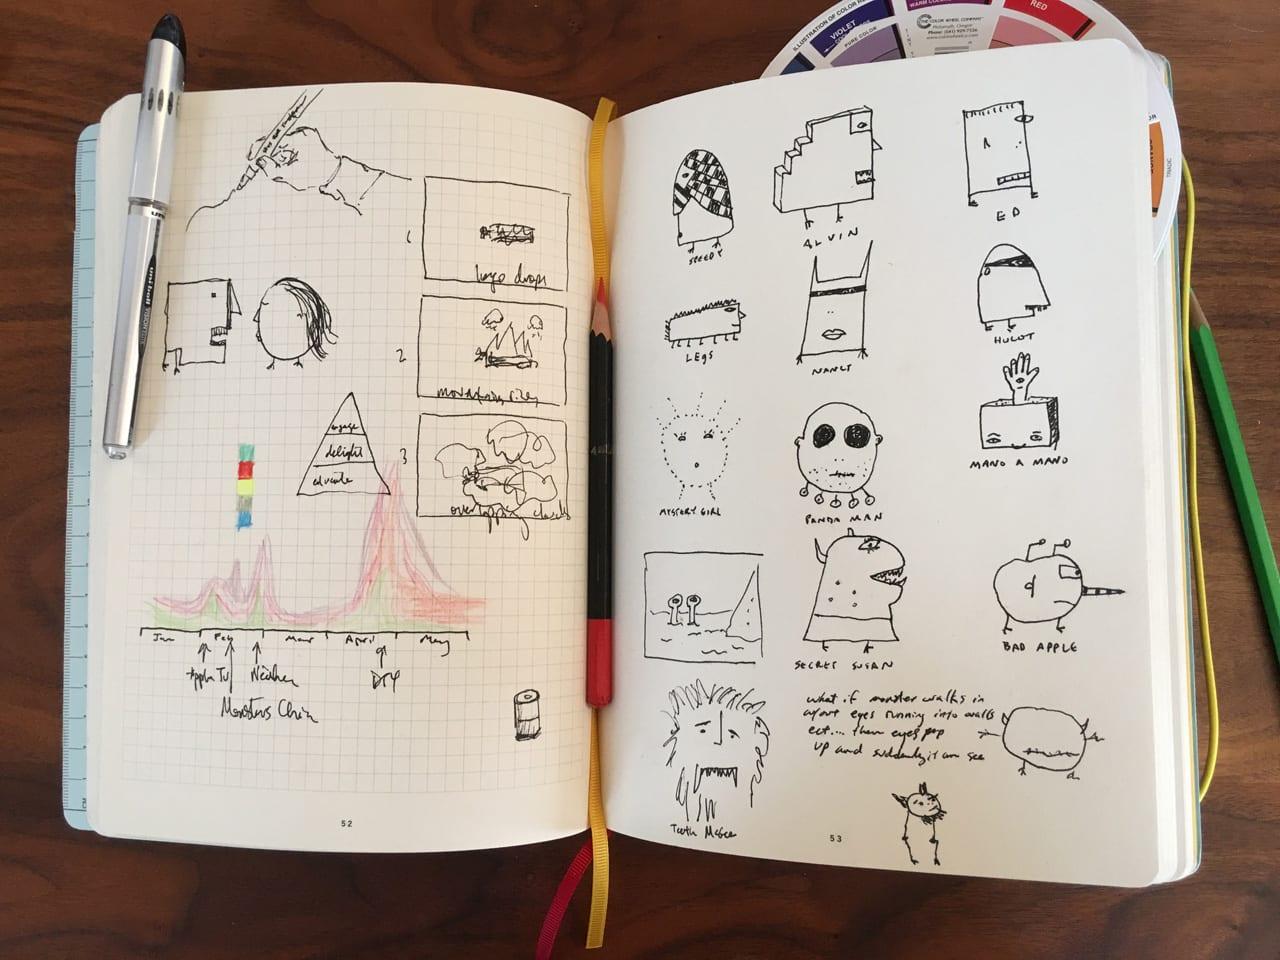 3056991 inline i 6 gutierrez1 16 famous designers show us inside their favorite notebooks copy - Aké zápisníky obľubujú dizajnéri?